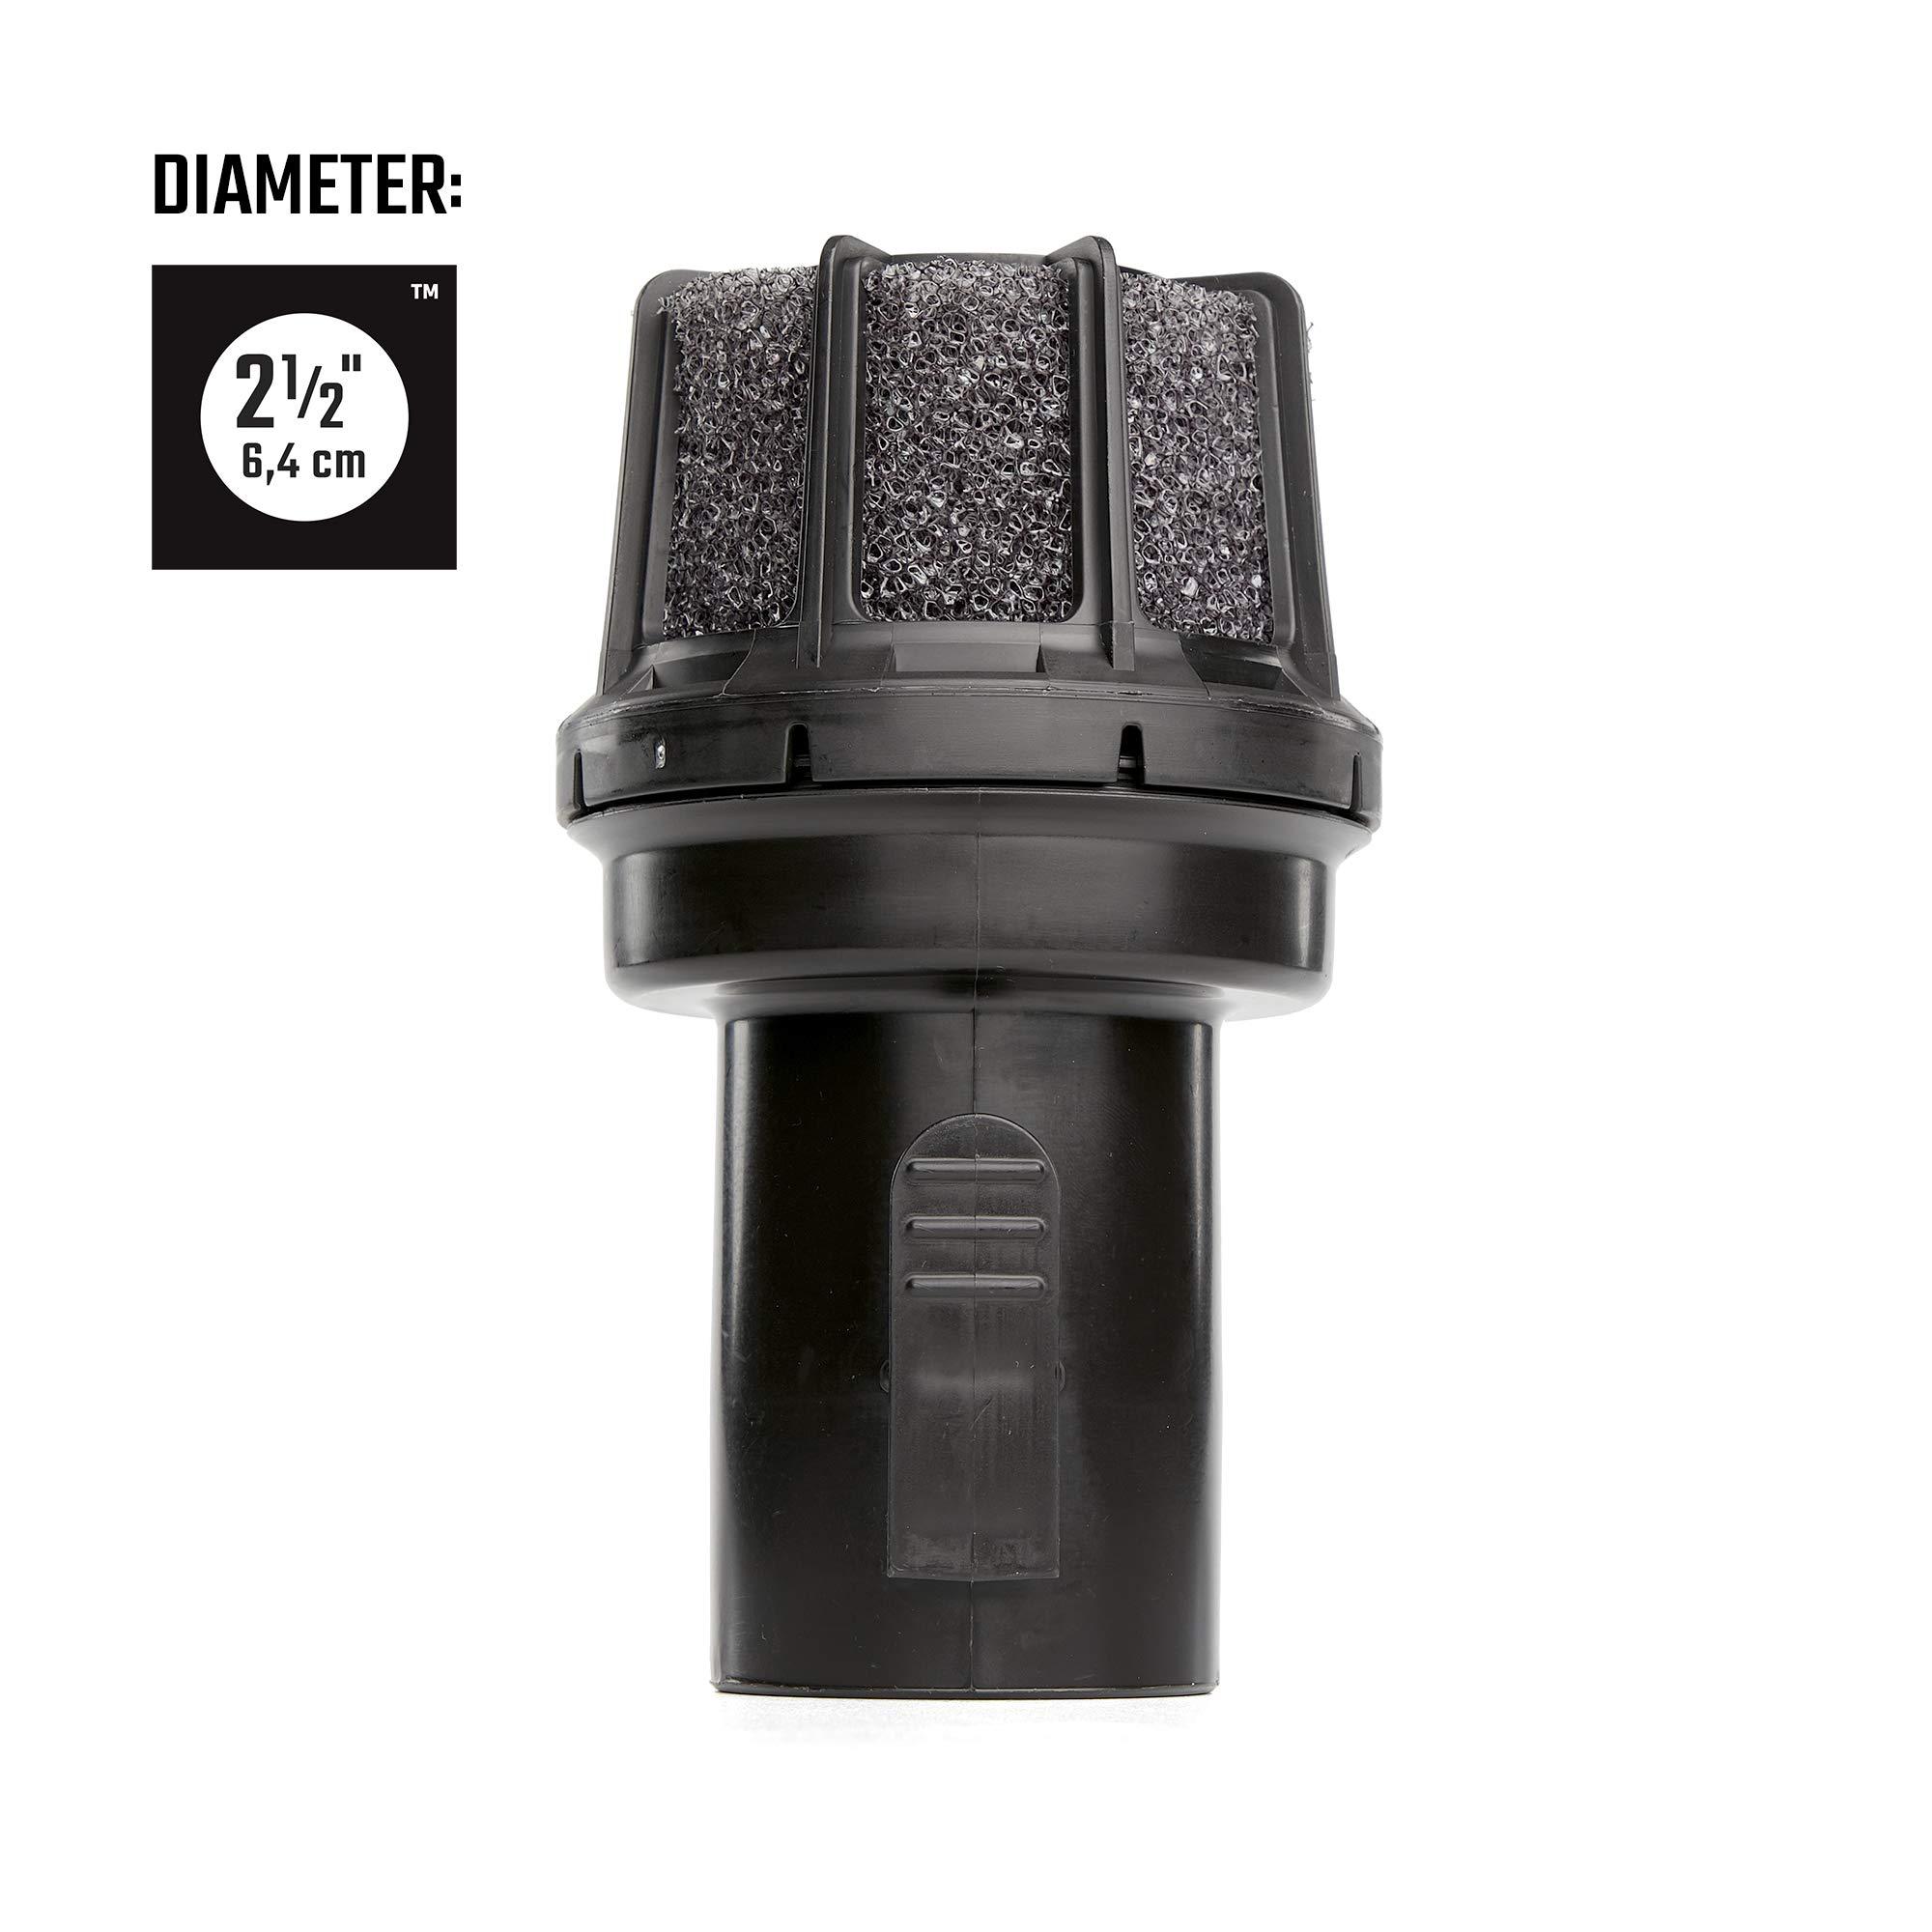 CRAFTSMAN CMXZVBE38660 2-1/2'' Muffler Diffuser Wet/Dry Vac Attachment by Craftsman (Image #1)